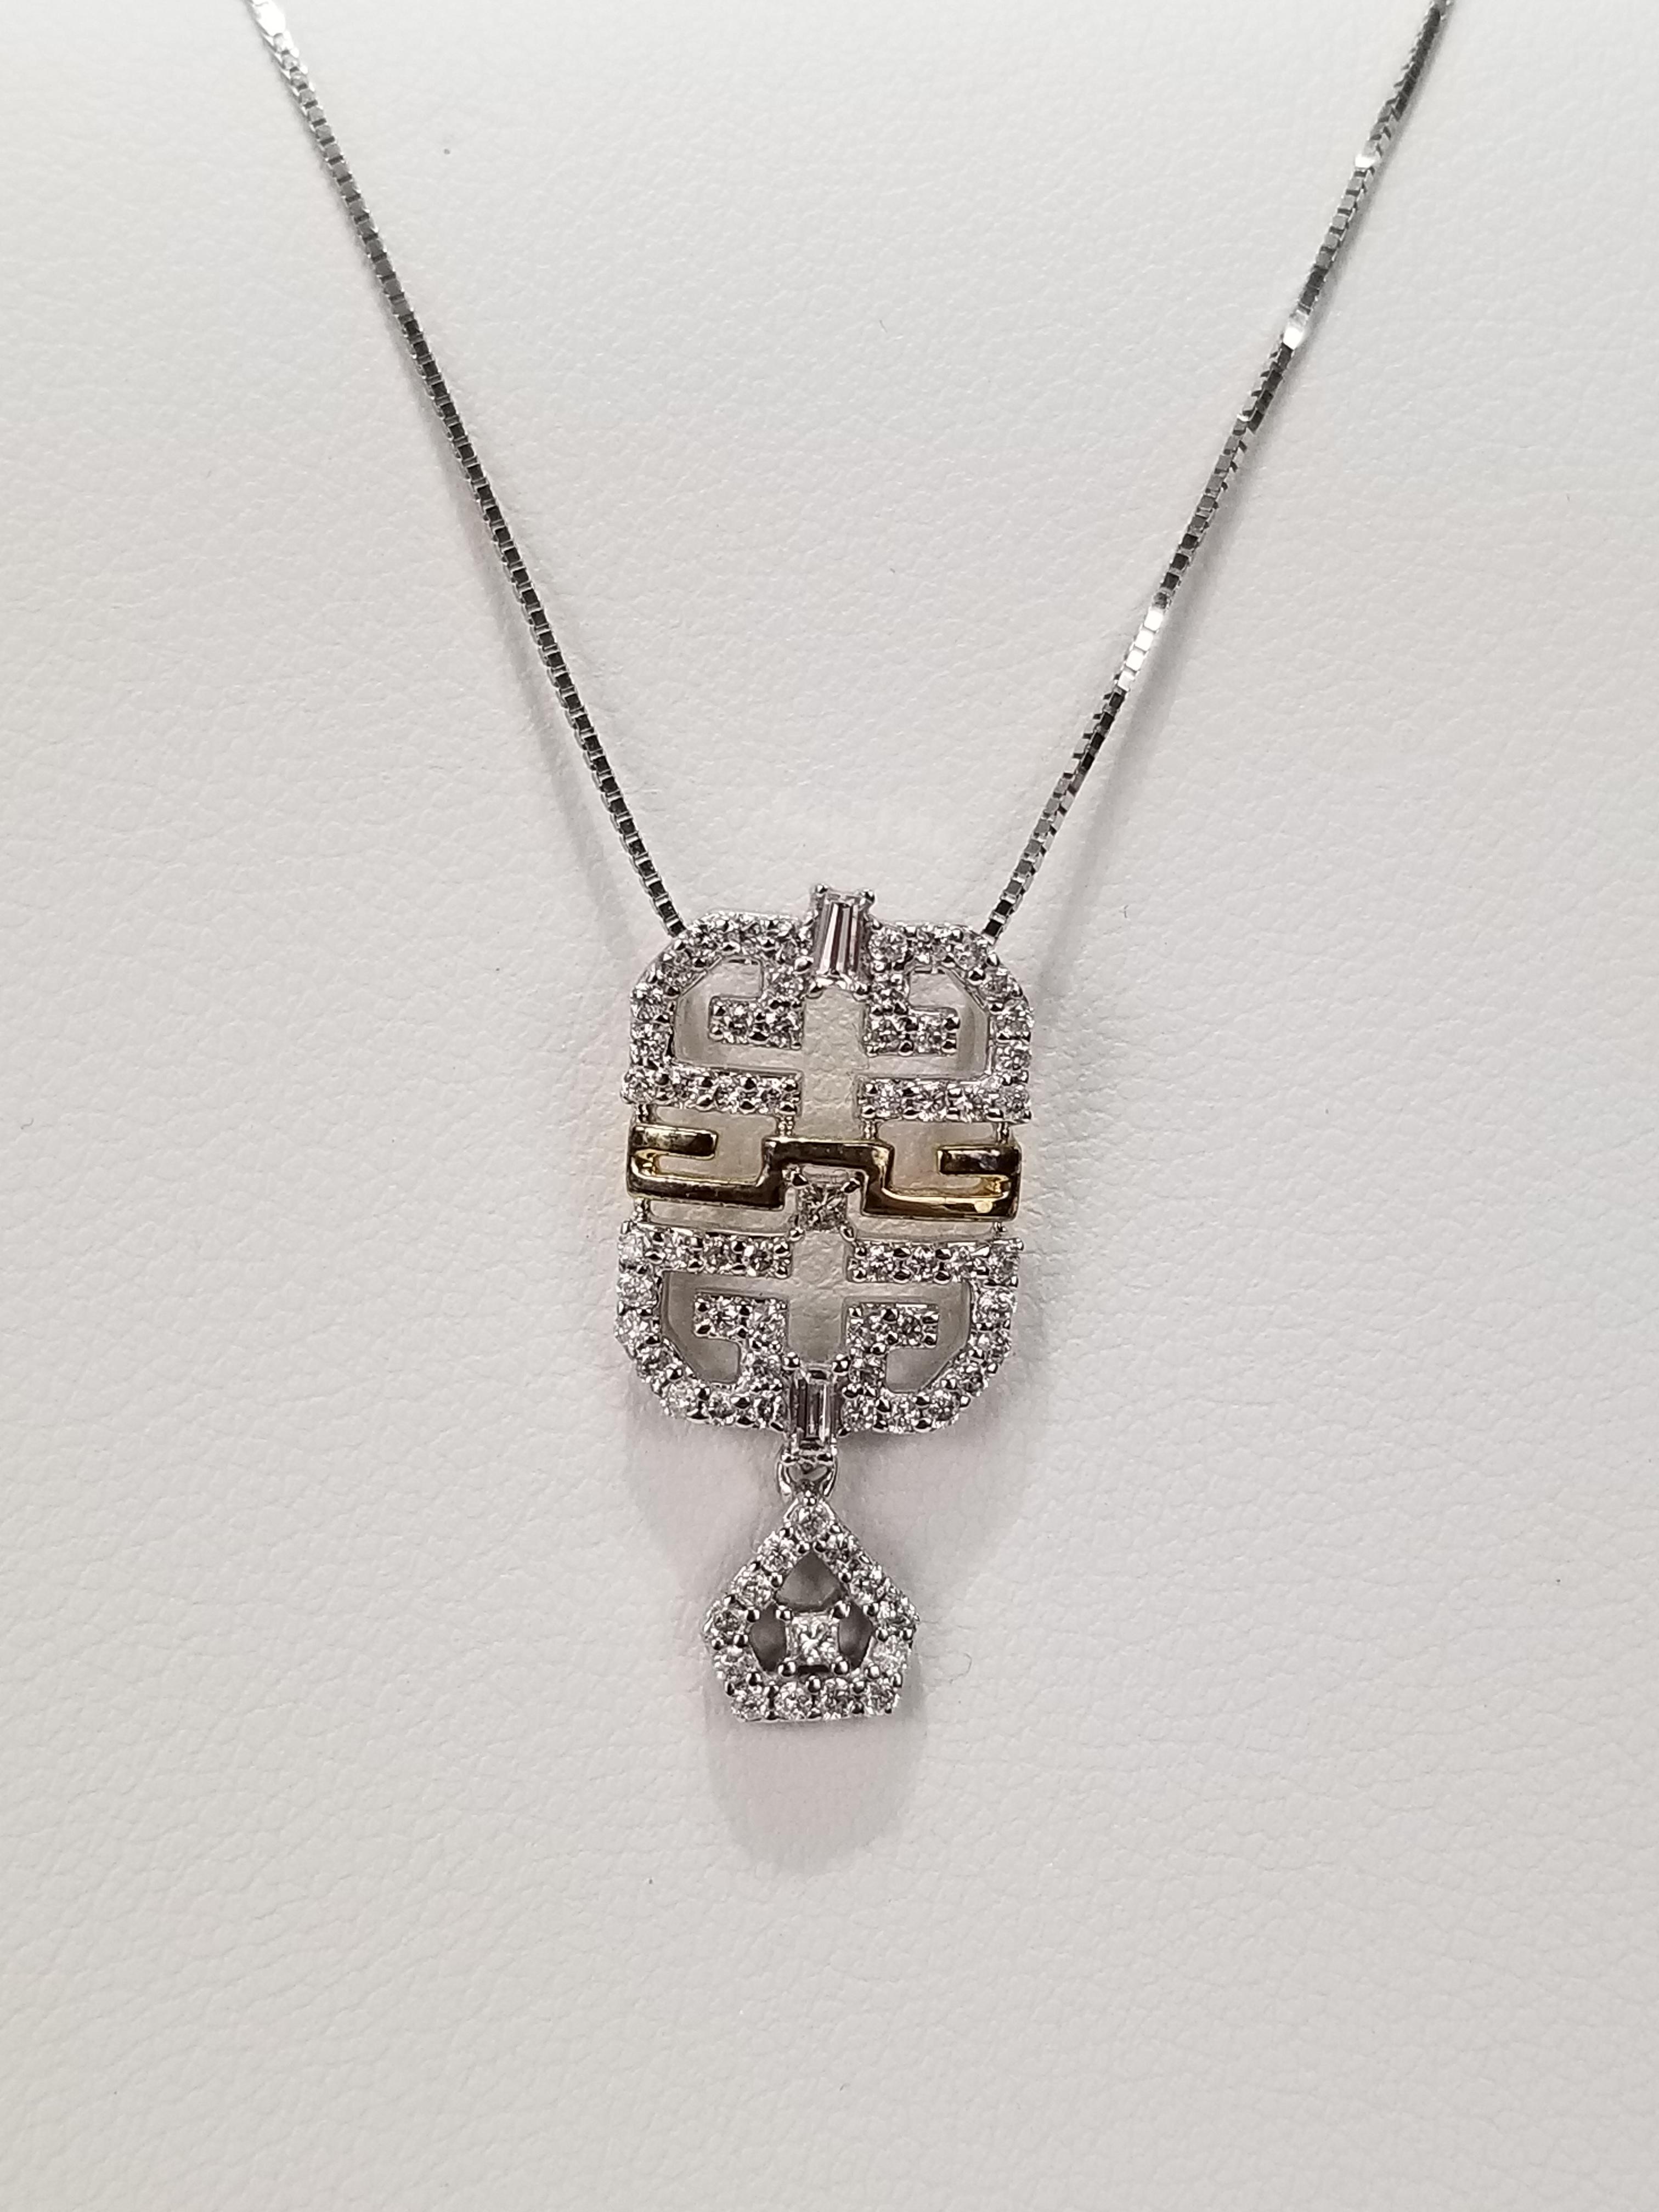 14K White & Yellow Gold Diamonds 0.44ct Regular Price $2495 SALE $695 Ref SR606